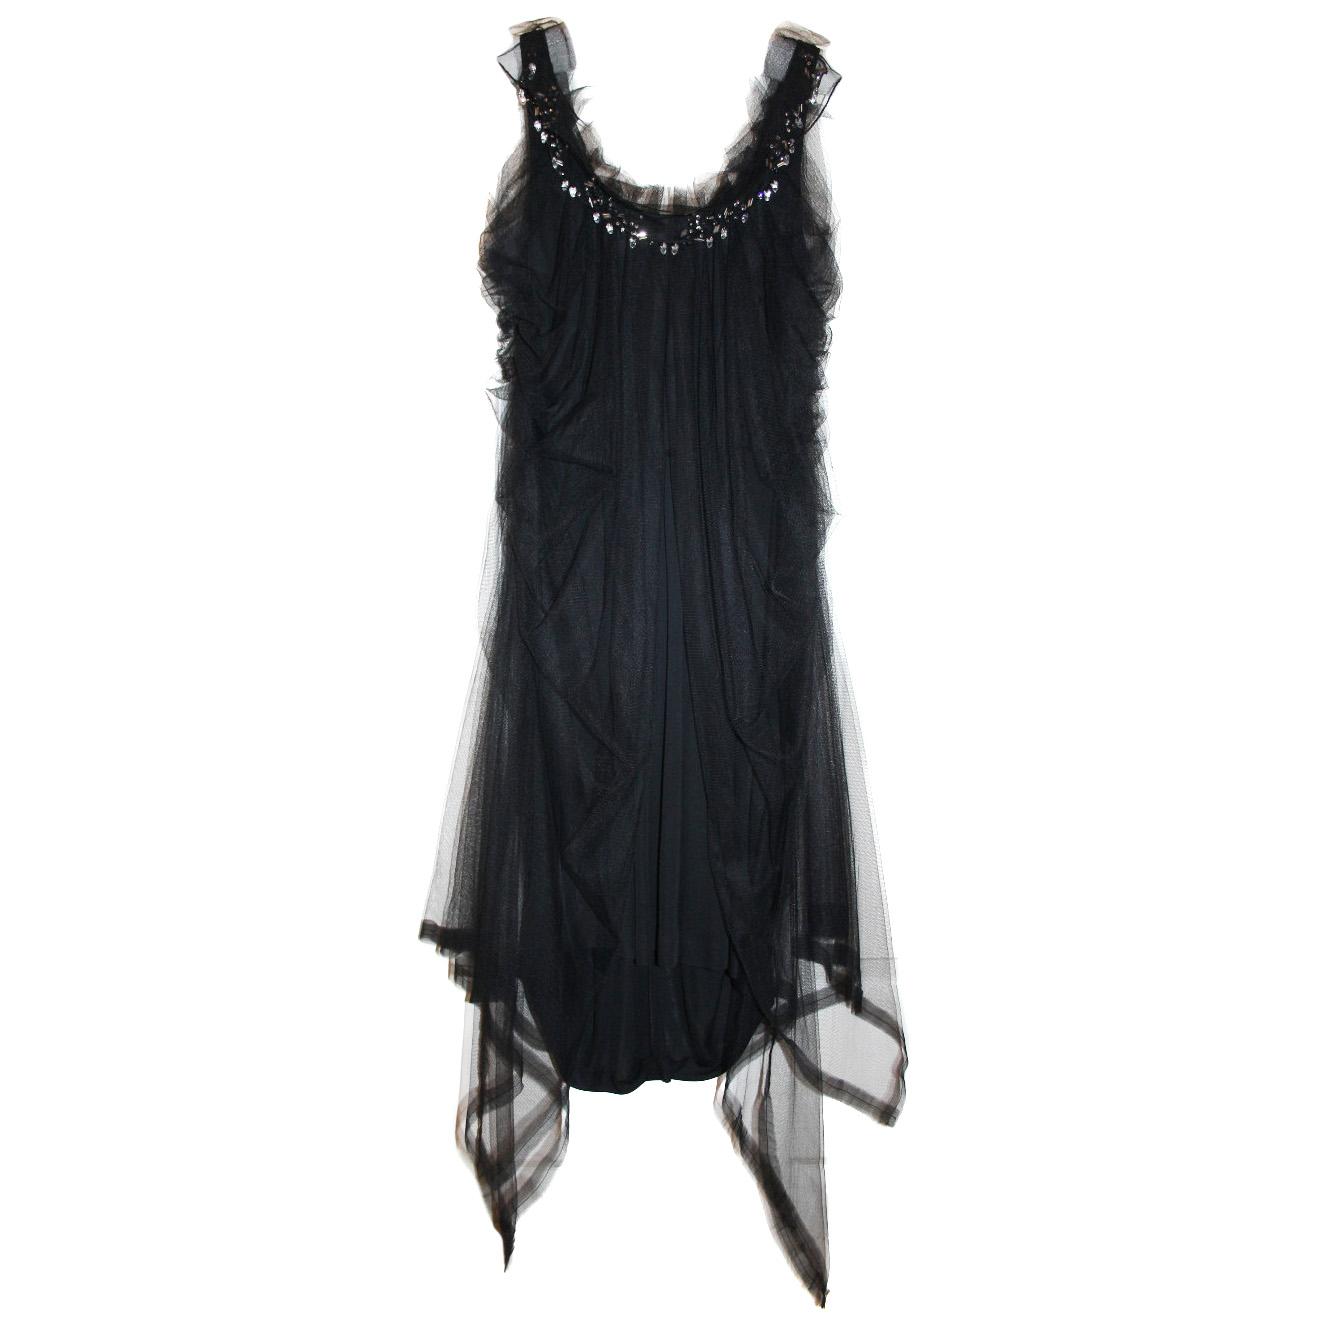 Nina Ricci black net & crystal-embellished evening dress